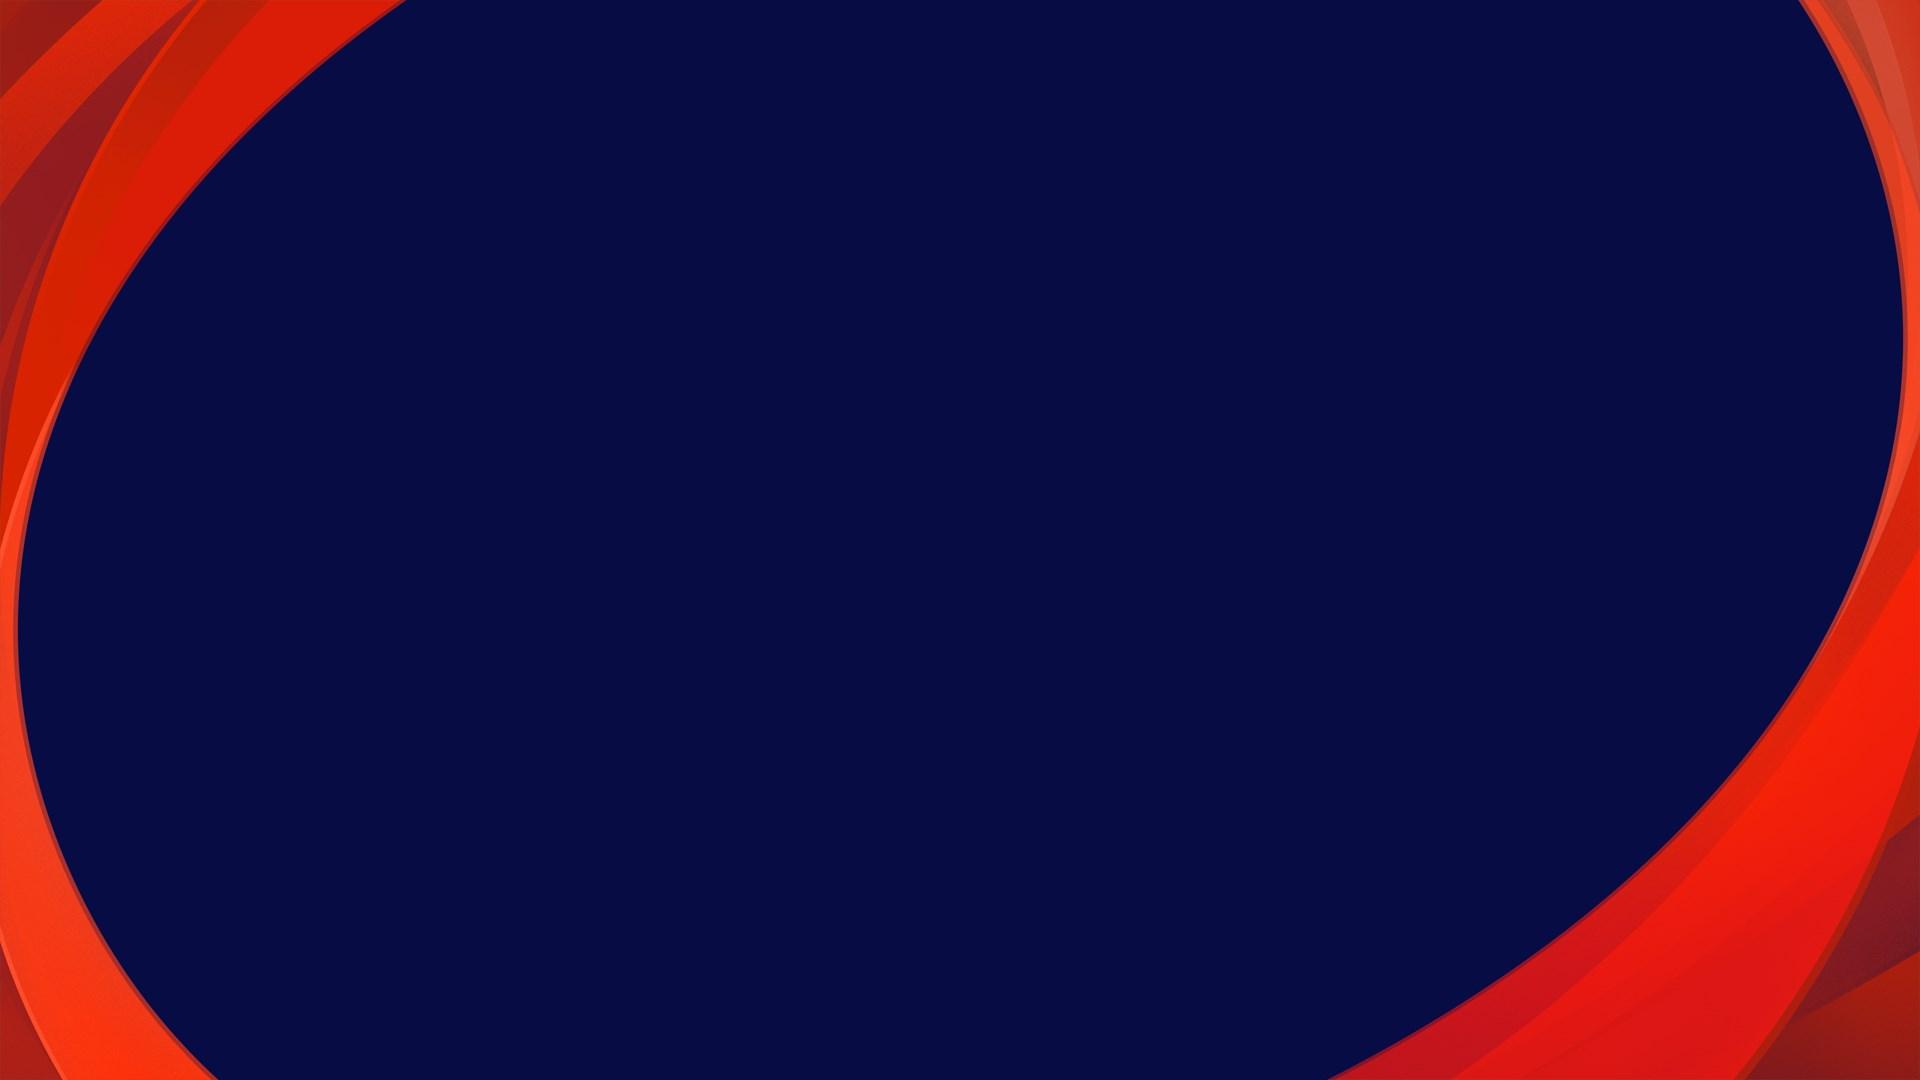 Pre-Order: eFootball PES 2021 SEASON UPDATE ARSENAL EDITION